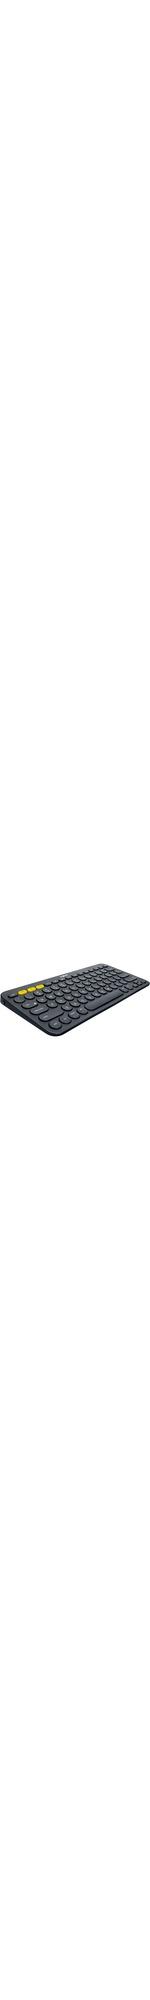 Logitech K380 Keyboard - Wireless Connectivity - Bluetooth - Black